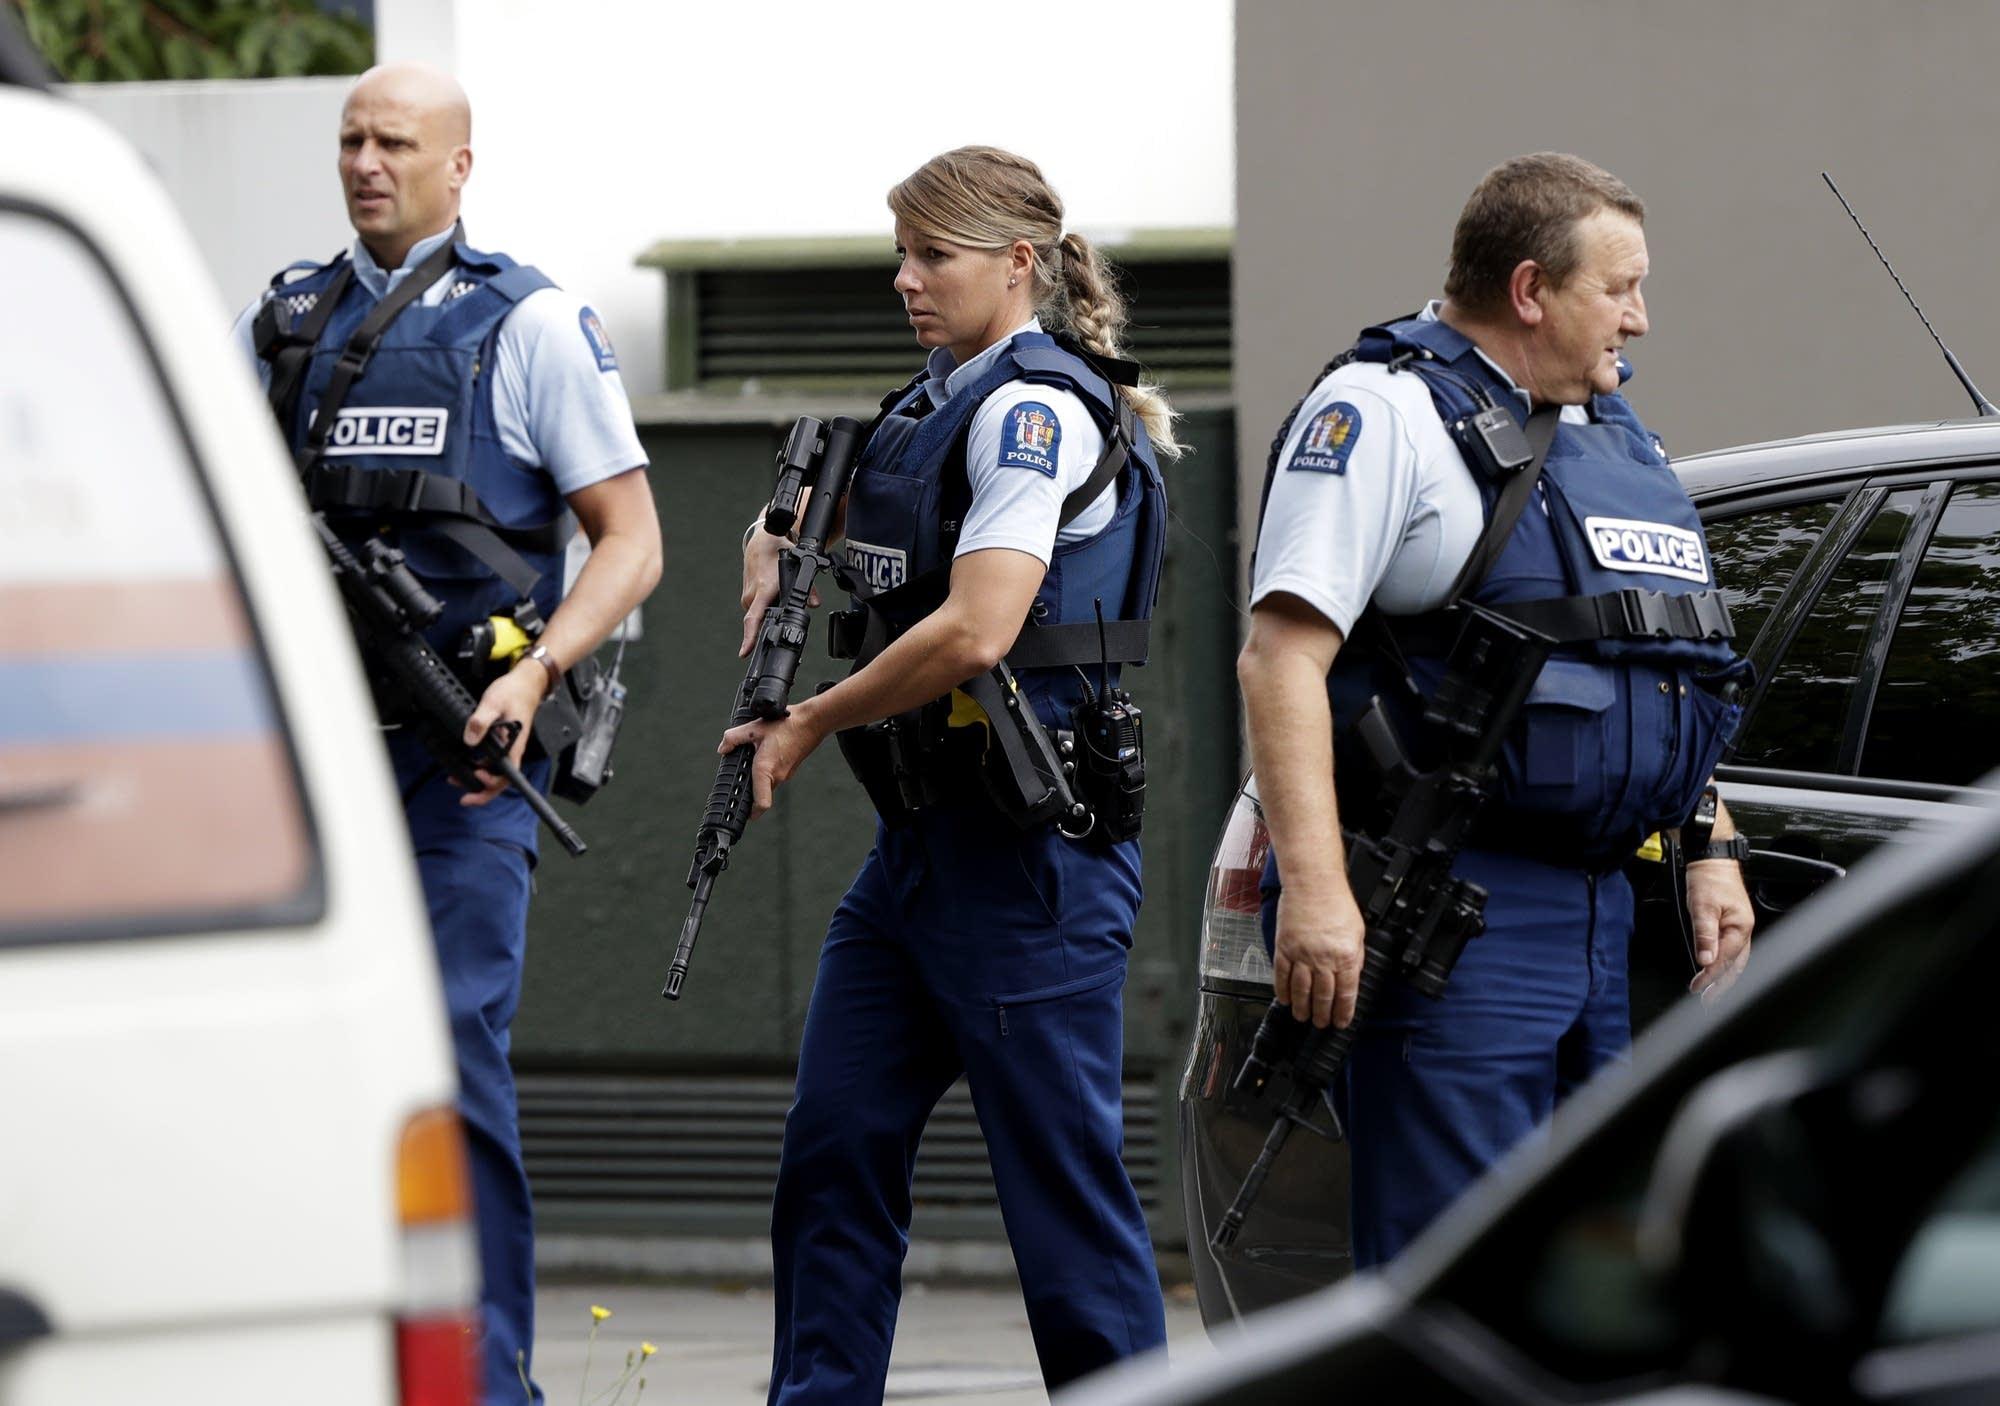 Mass Shooting Christchurch Video News: Mass Shootings At New Zealand Mosques Kill 49; 1 Man